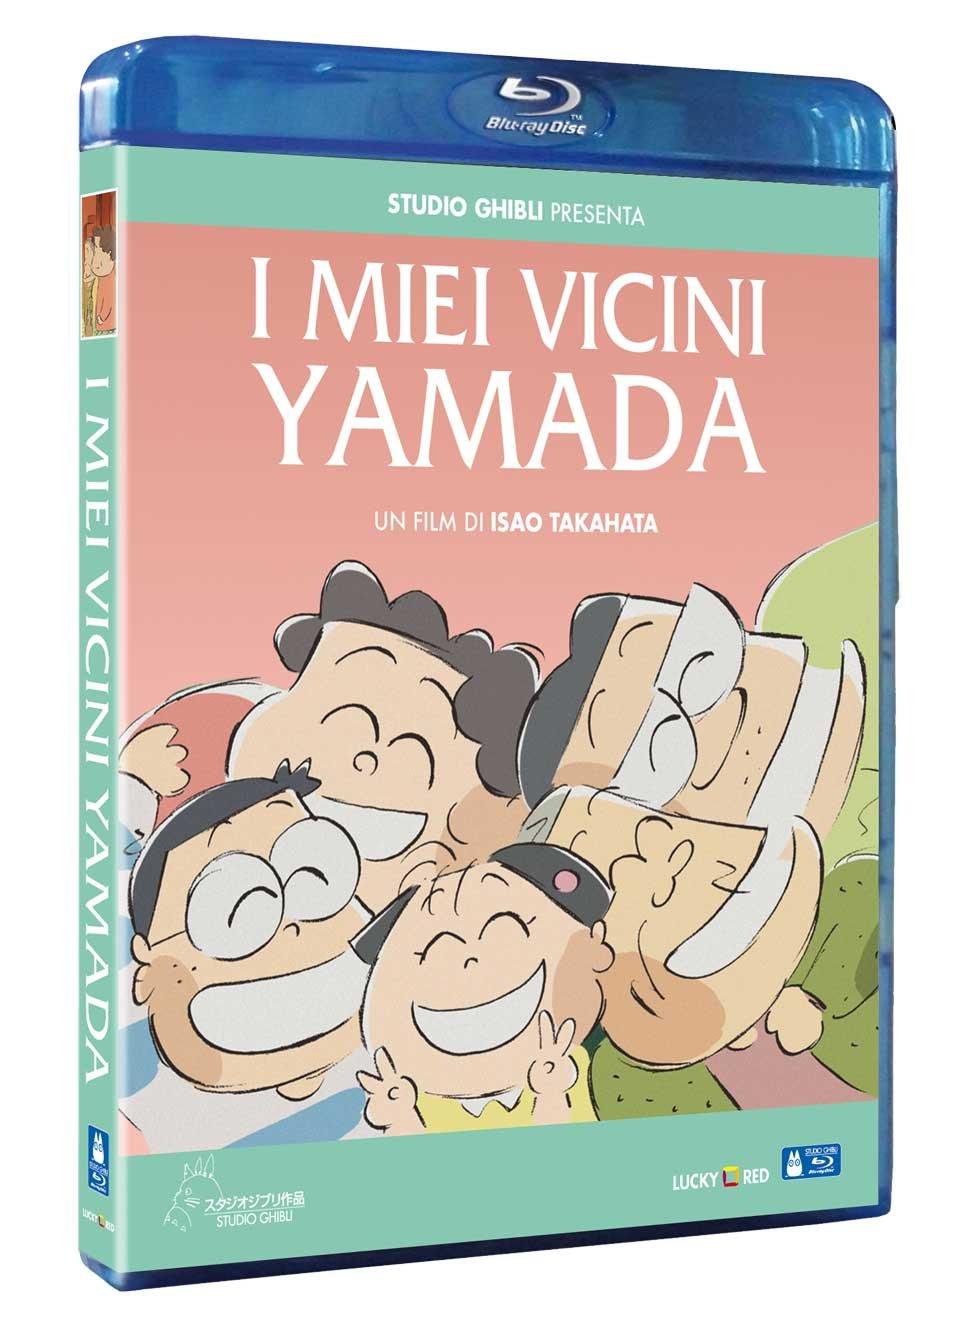 I miei vicini Yamada (1999) FULL HD 1080p  VU AC3 DTS HD MA ITA JAP Subs DDN